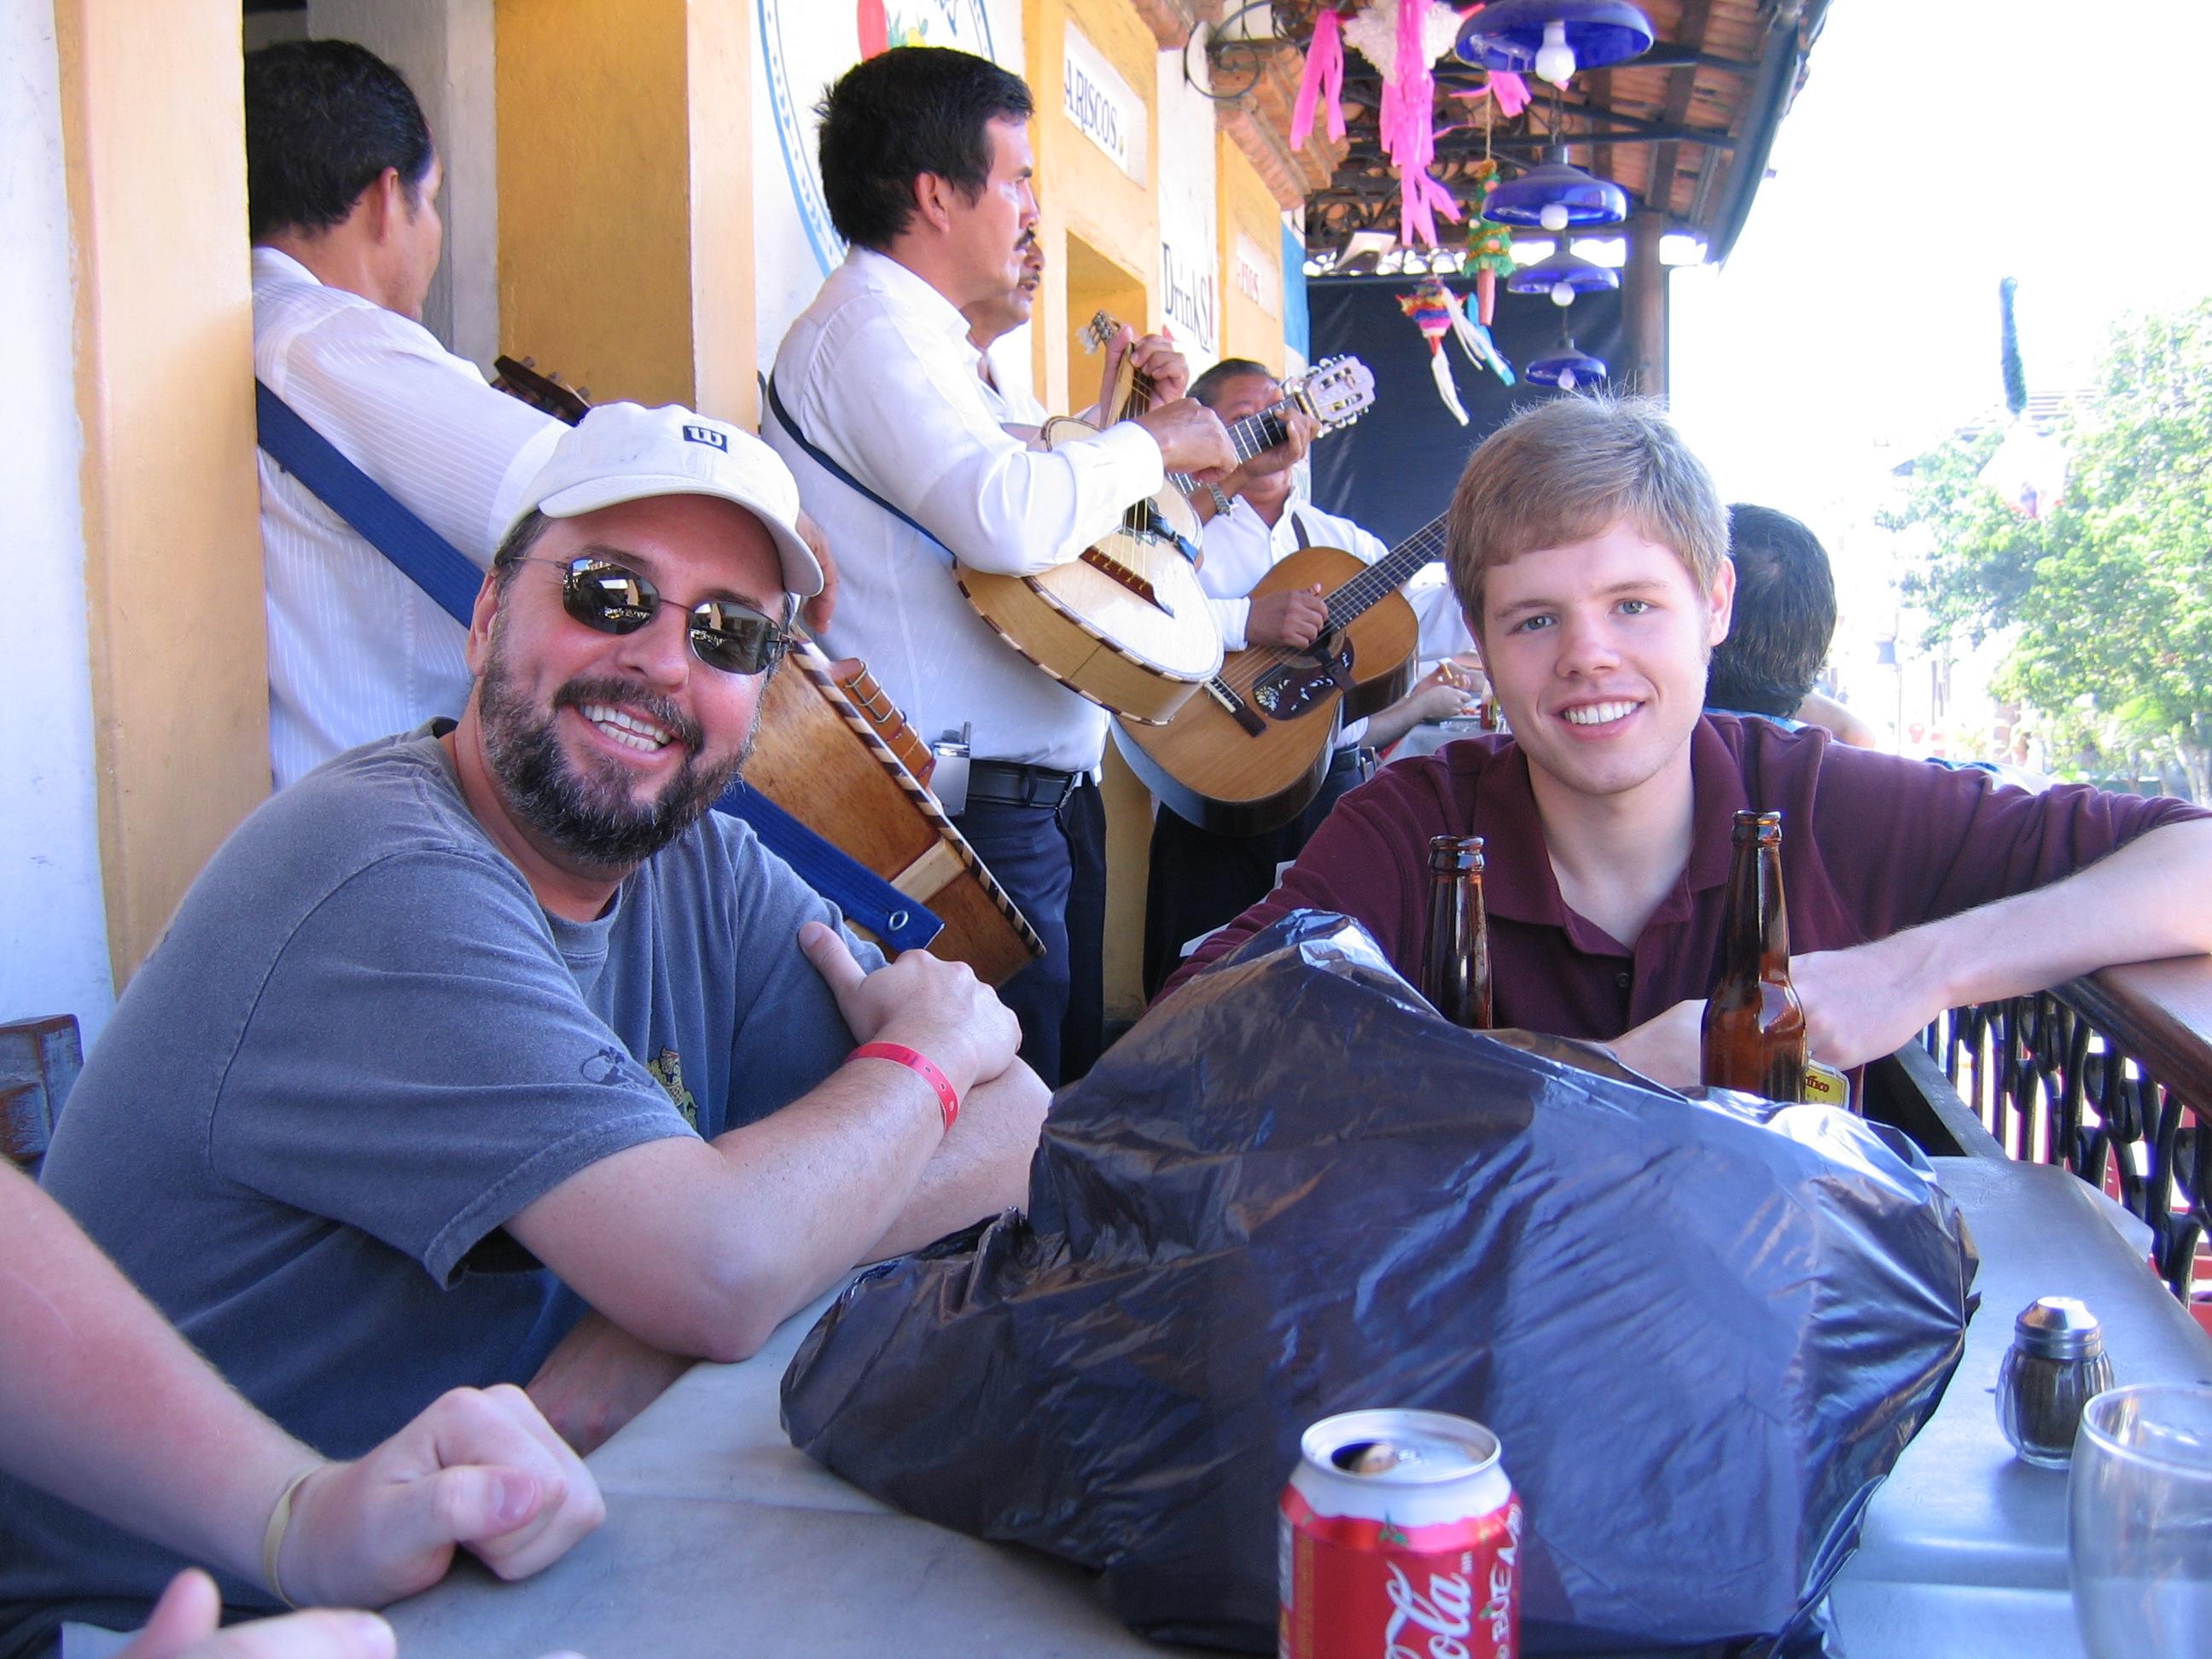 Enjoying a mariachi band in Puerto Vallarta